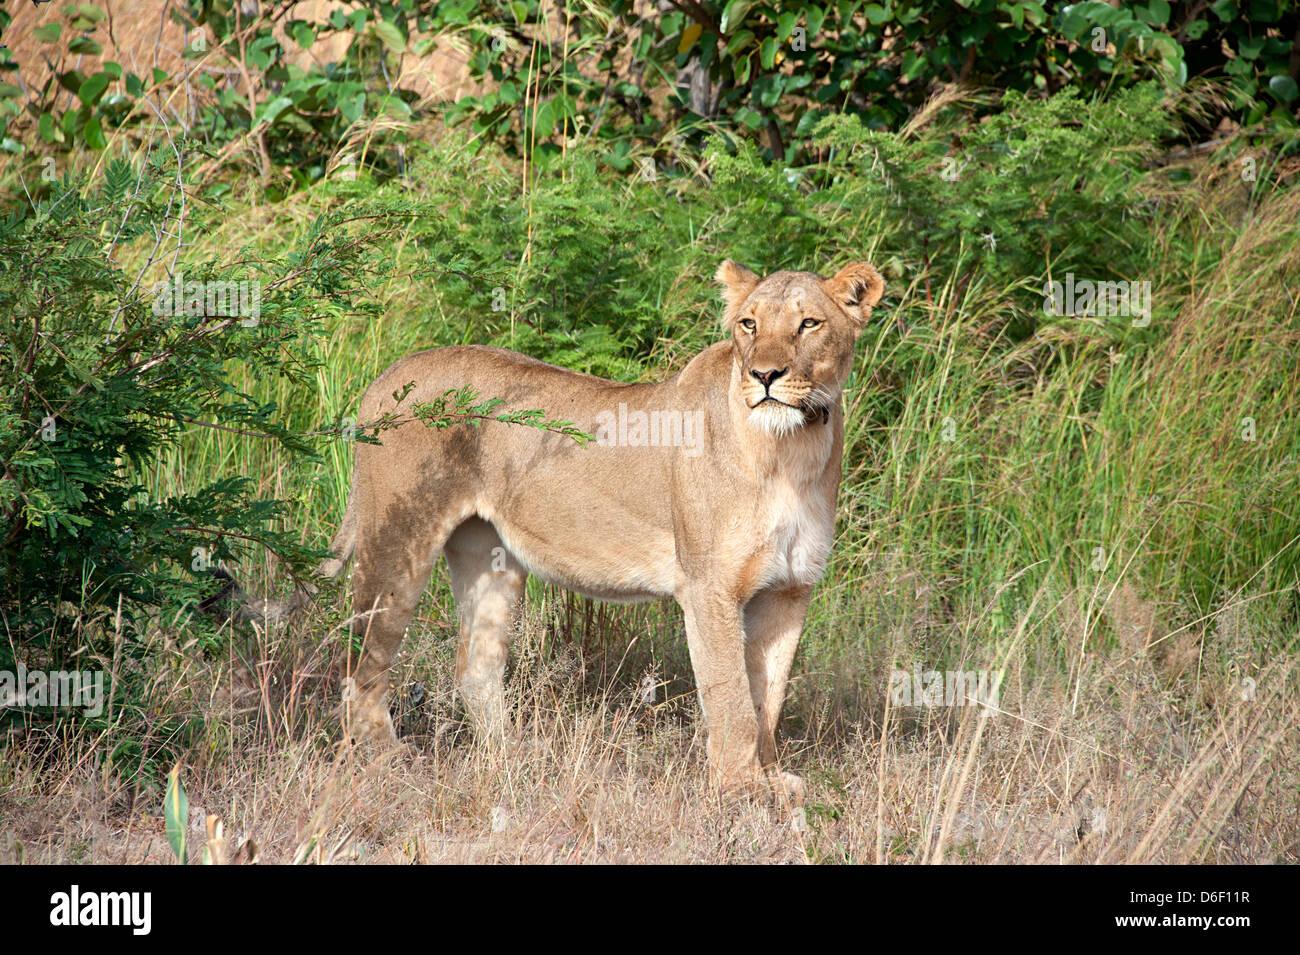 African lion surveys the Savannah in Antelope Park, Zimbabwe. - Stock Image